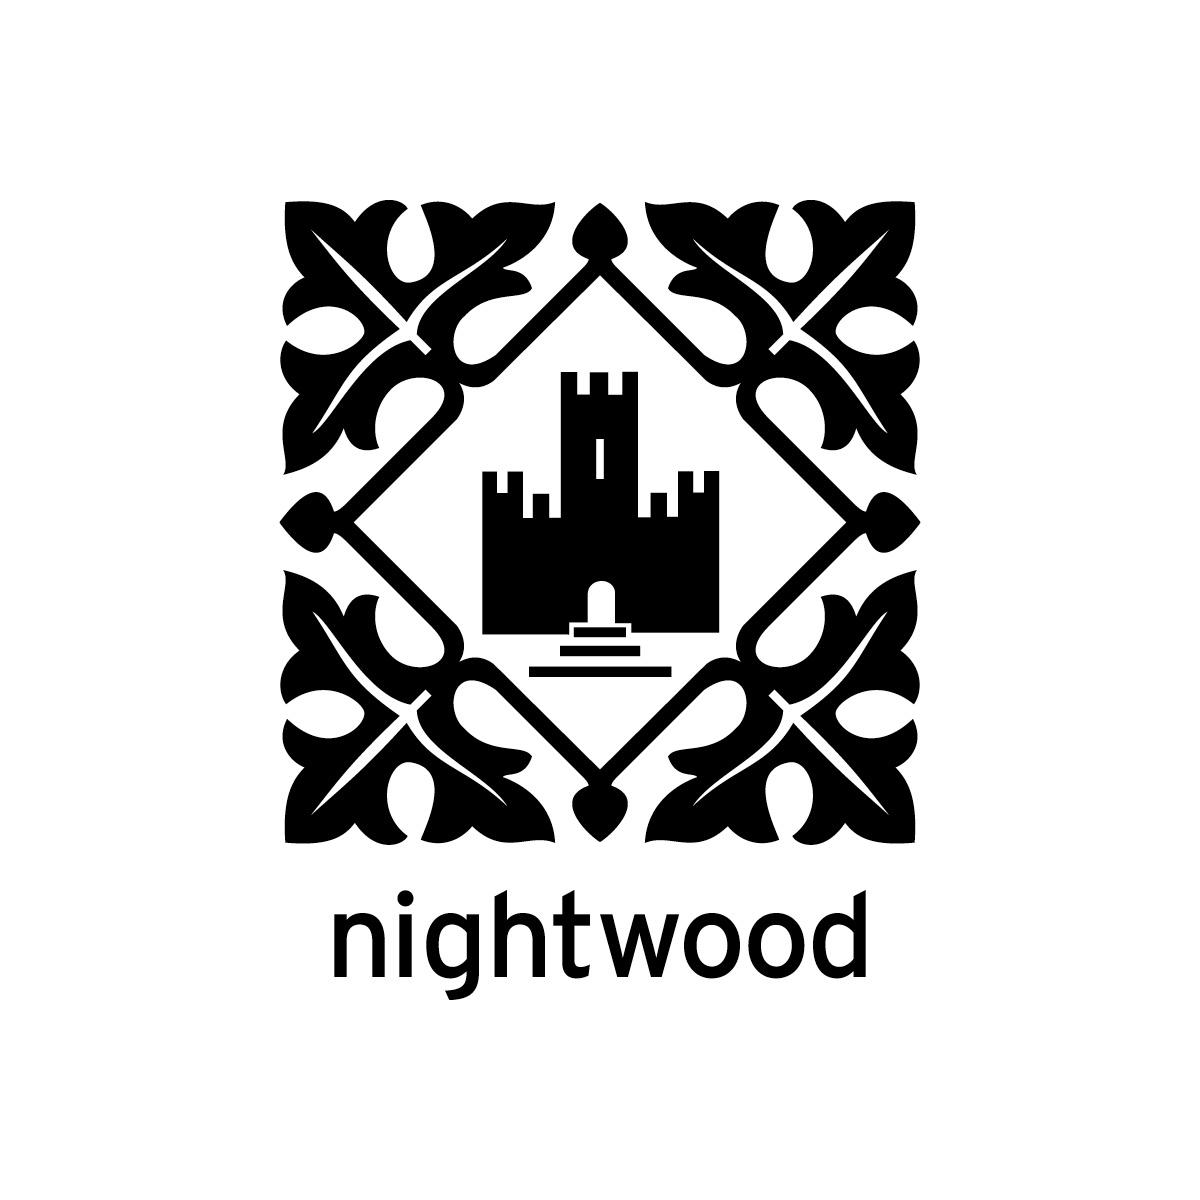 Nightwood_logo.jpg